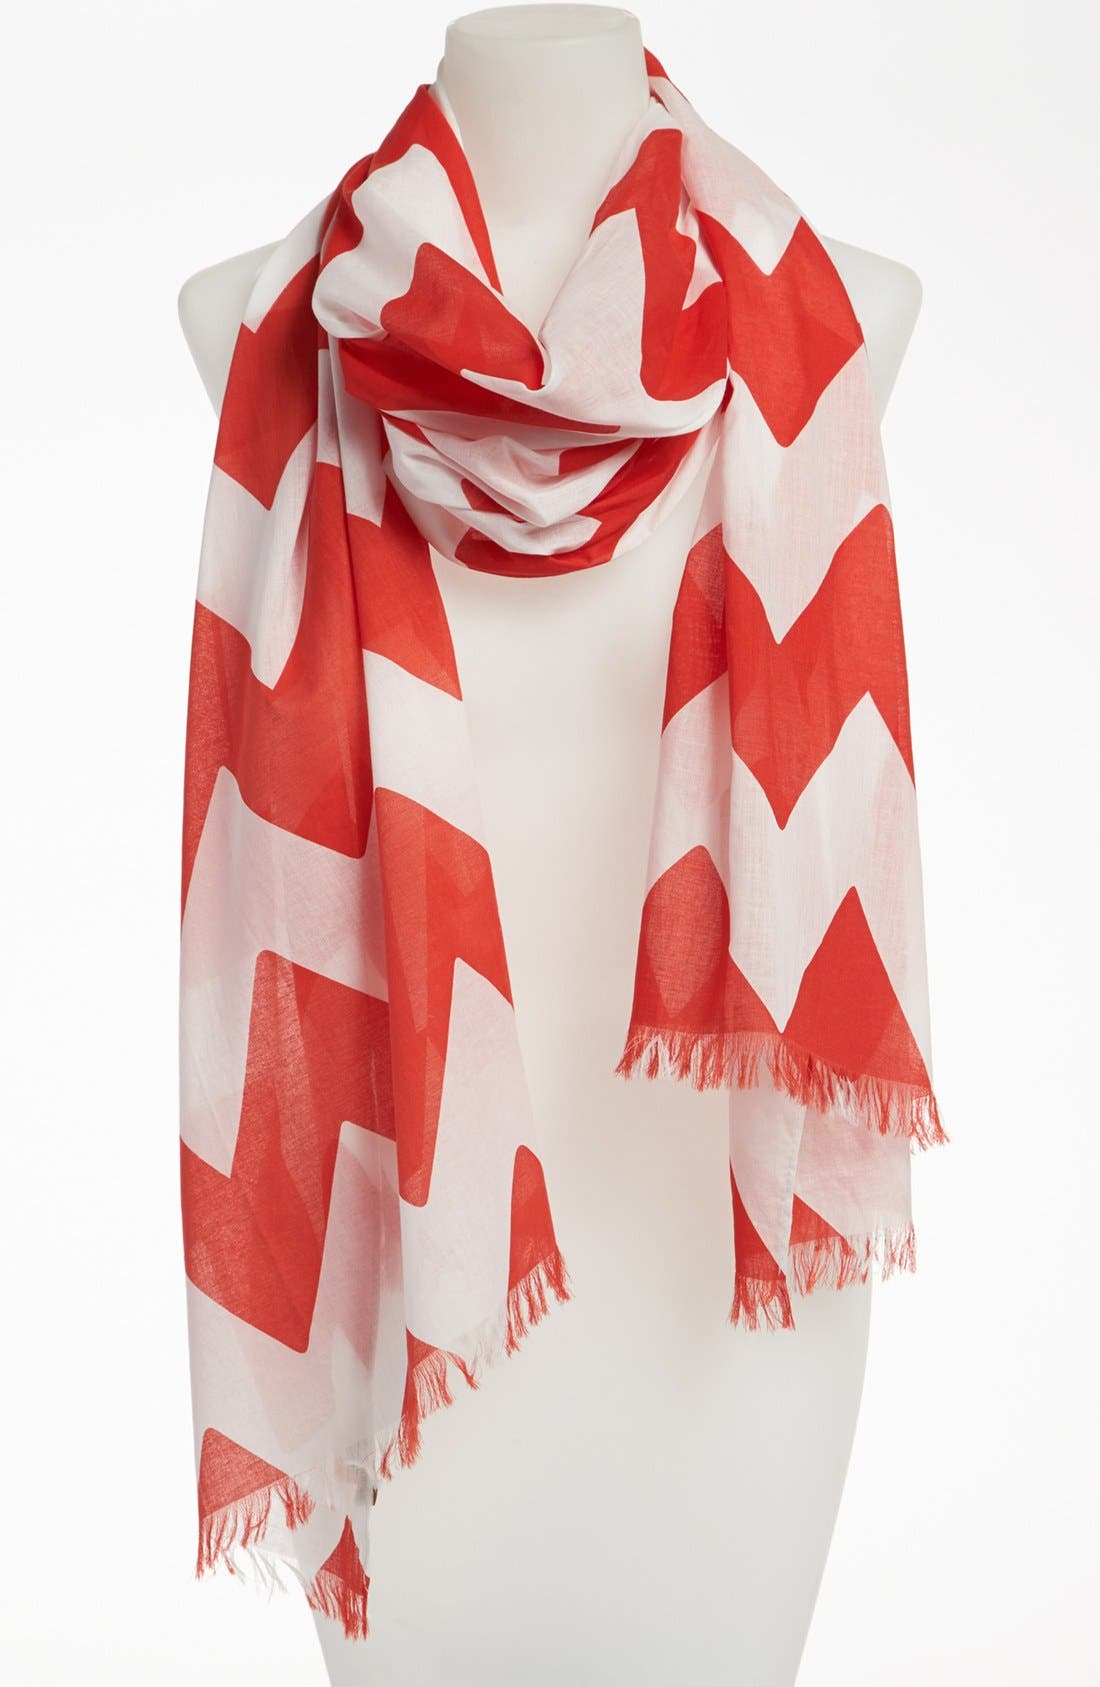 Main Image - kate spade new york 'chevron stripe' scarf